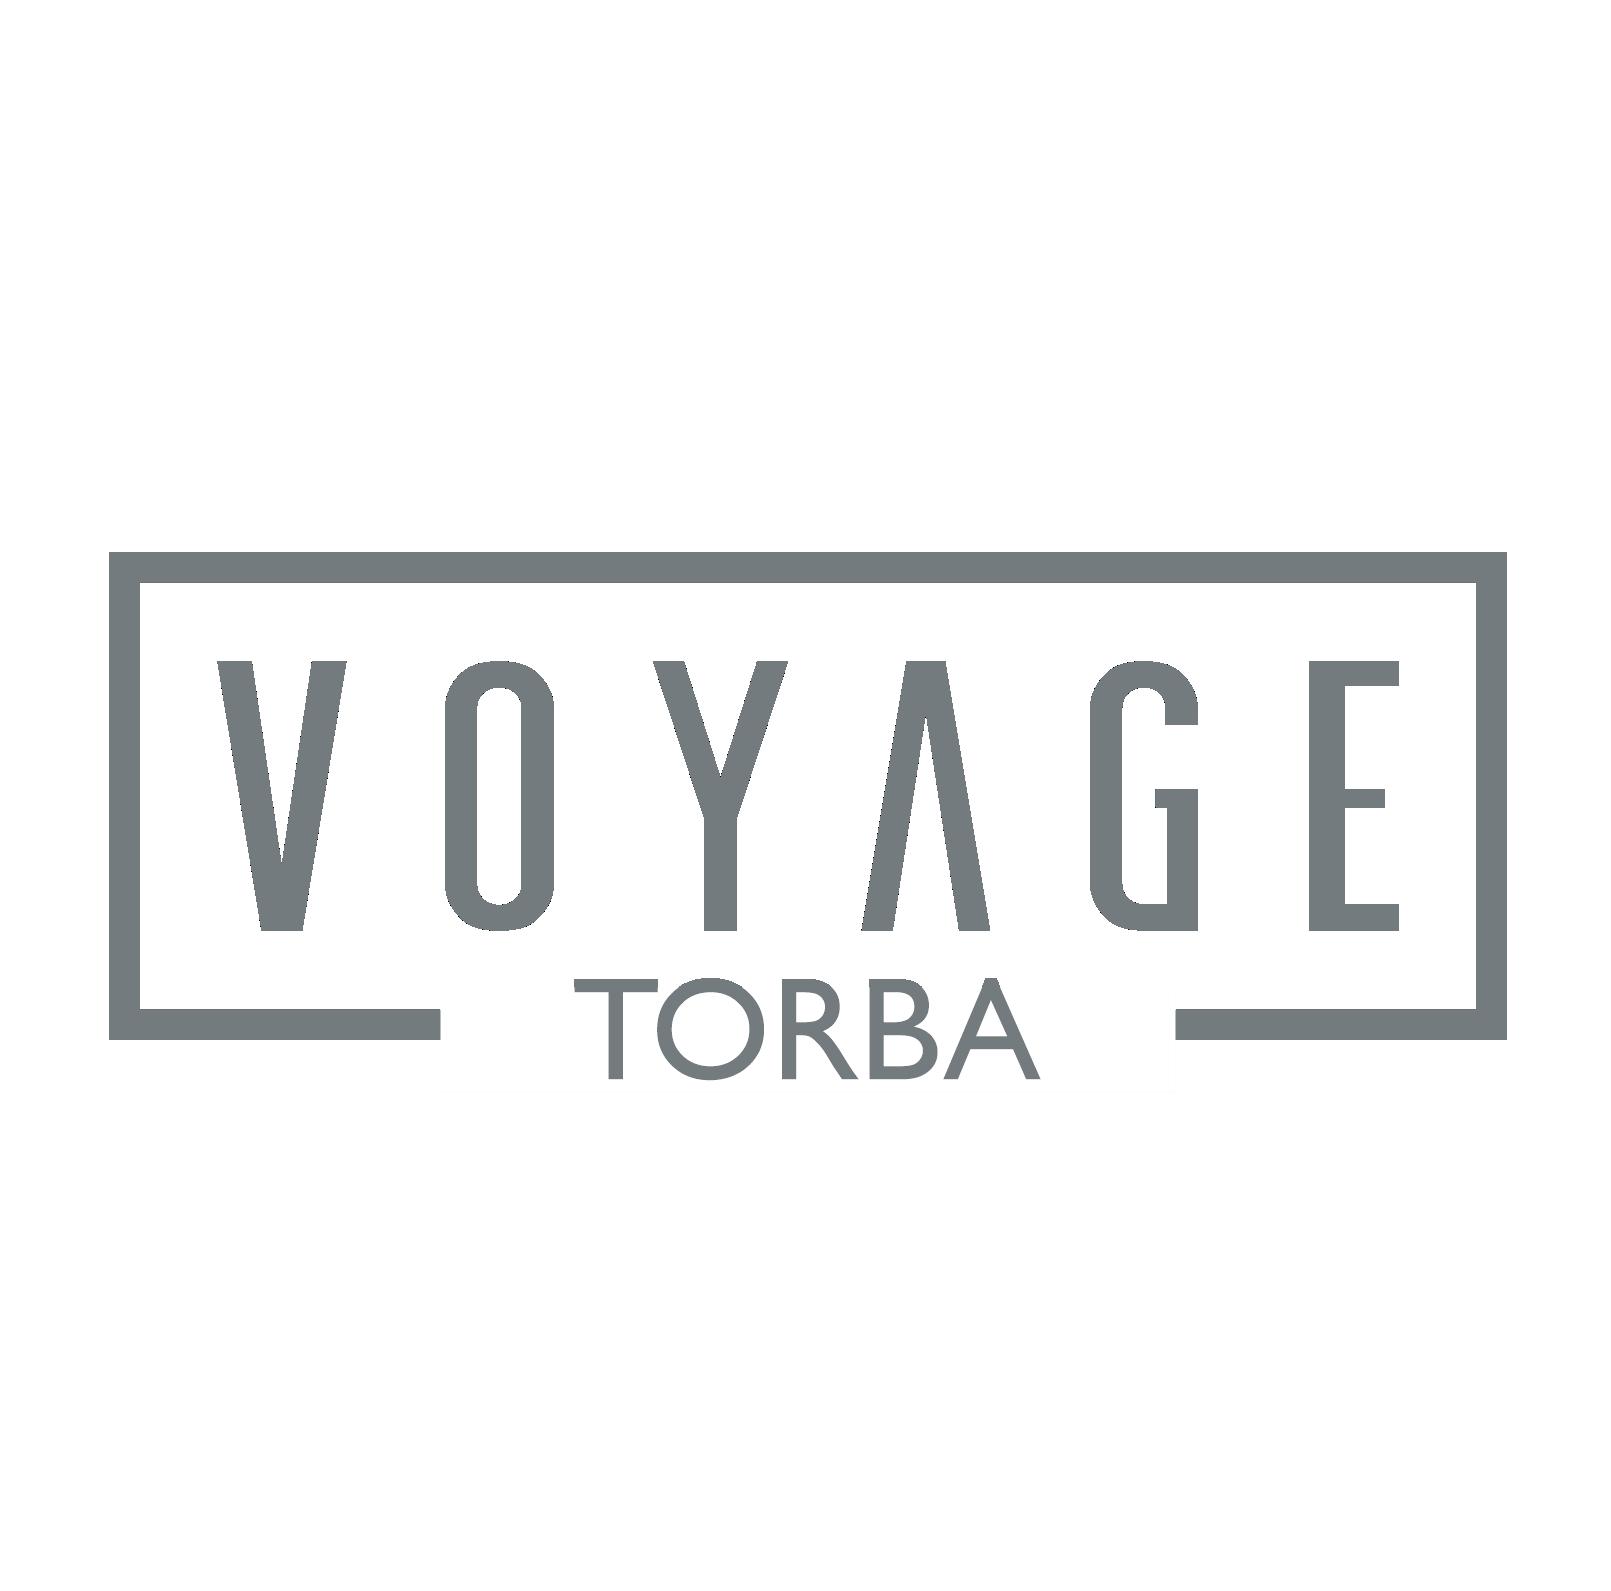 VOYAGE TORBA